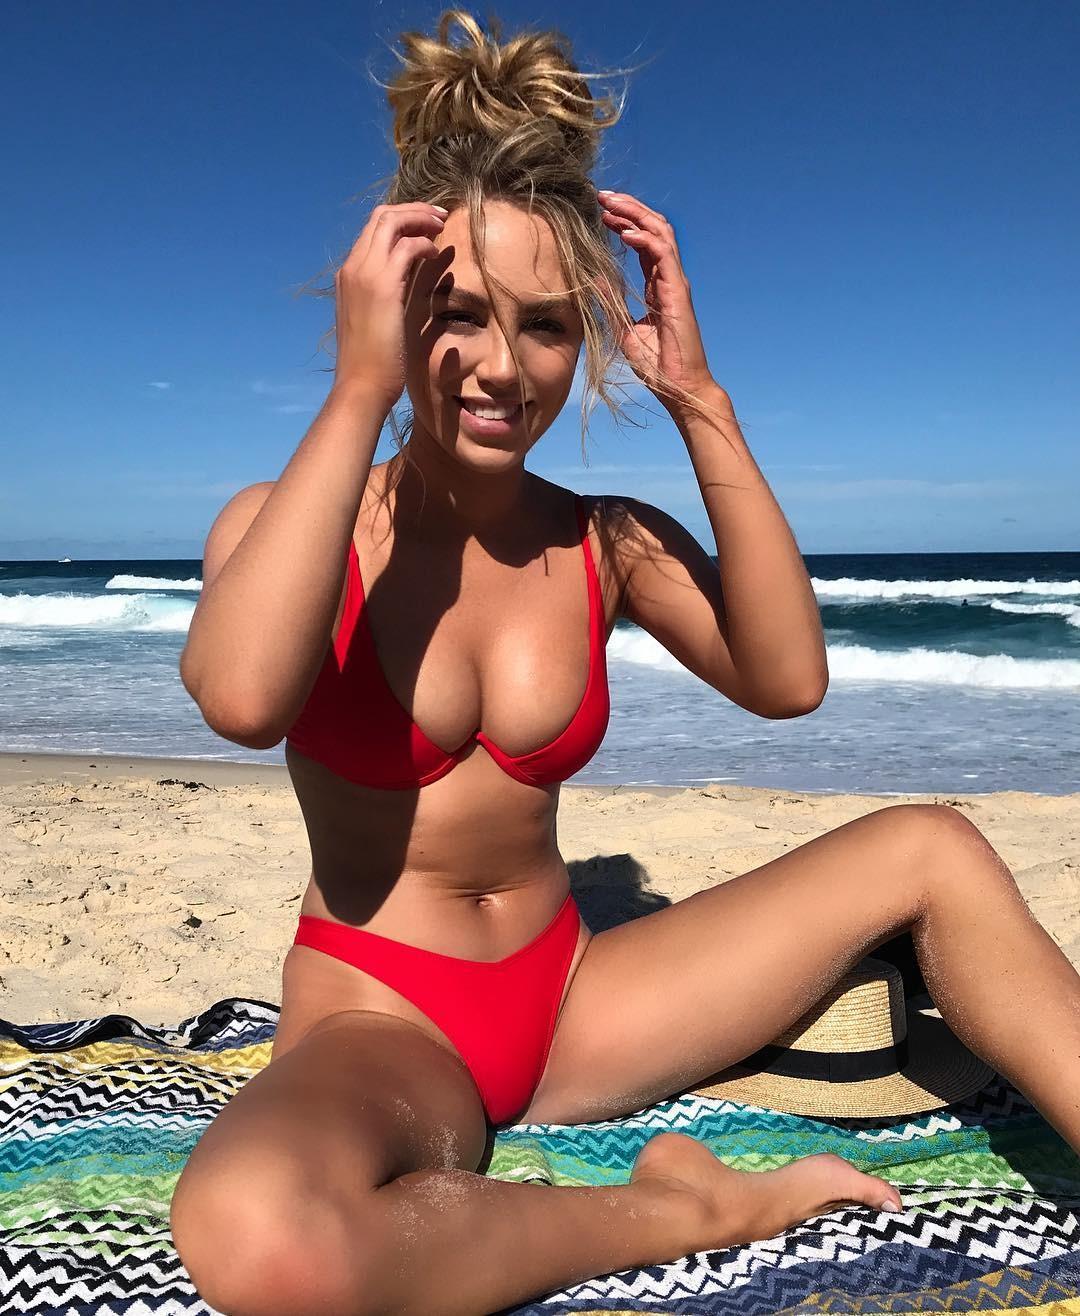 Фото красивой девушки в бикини на море